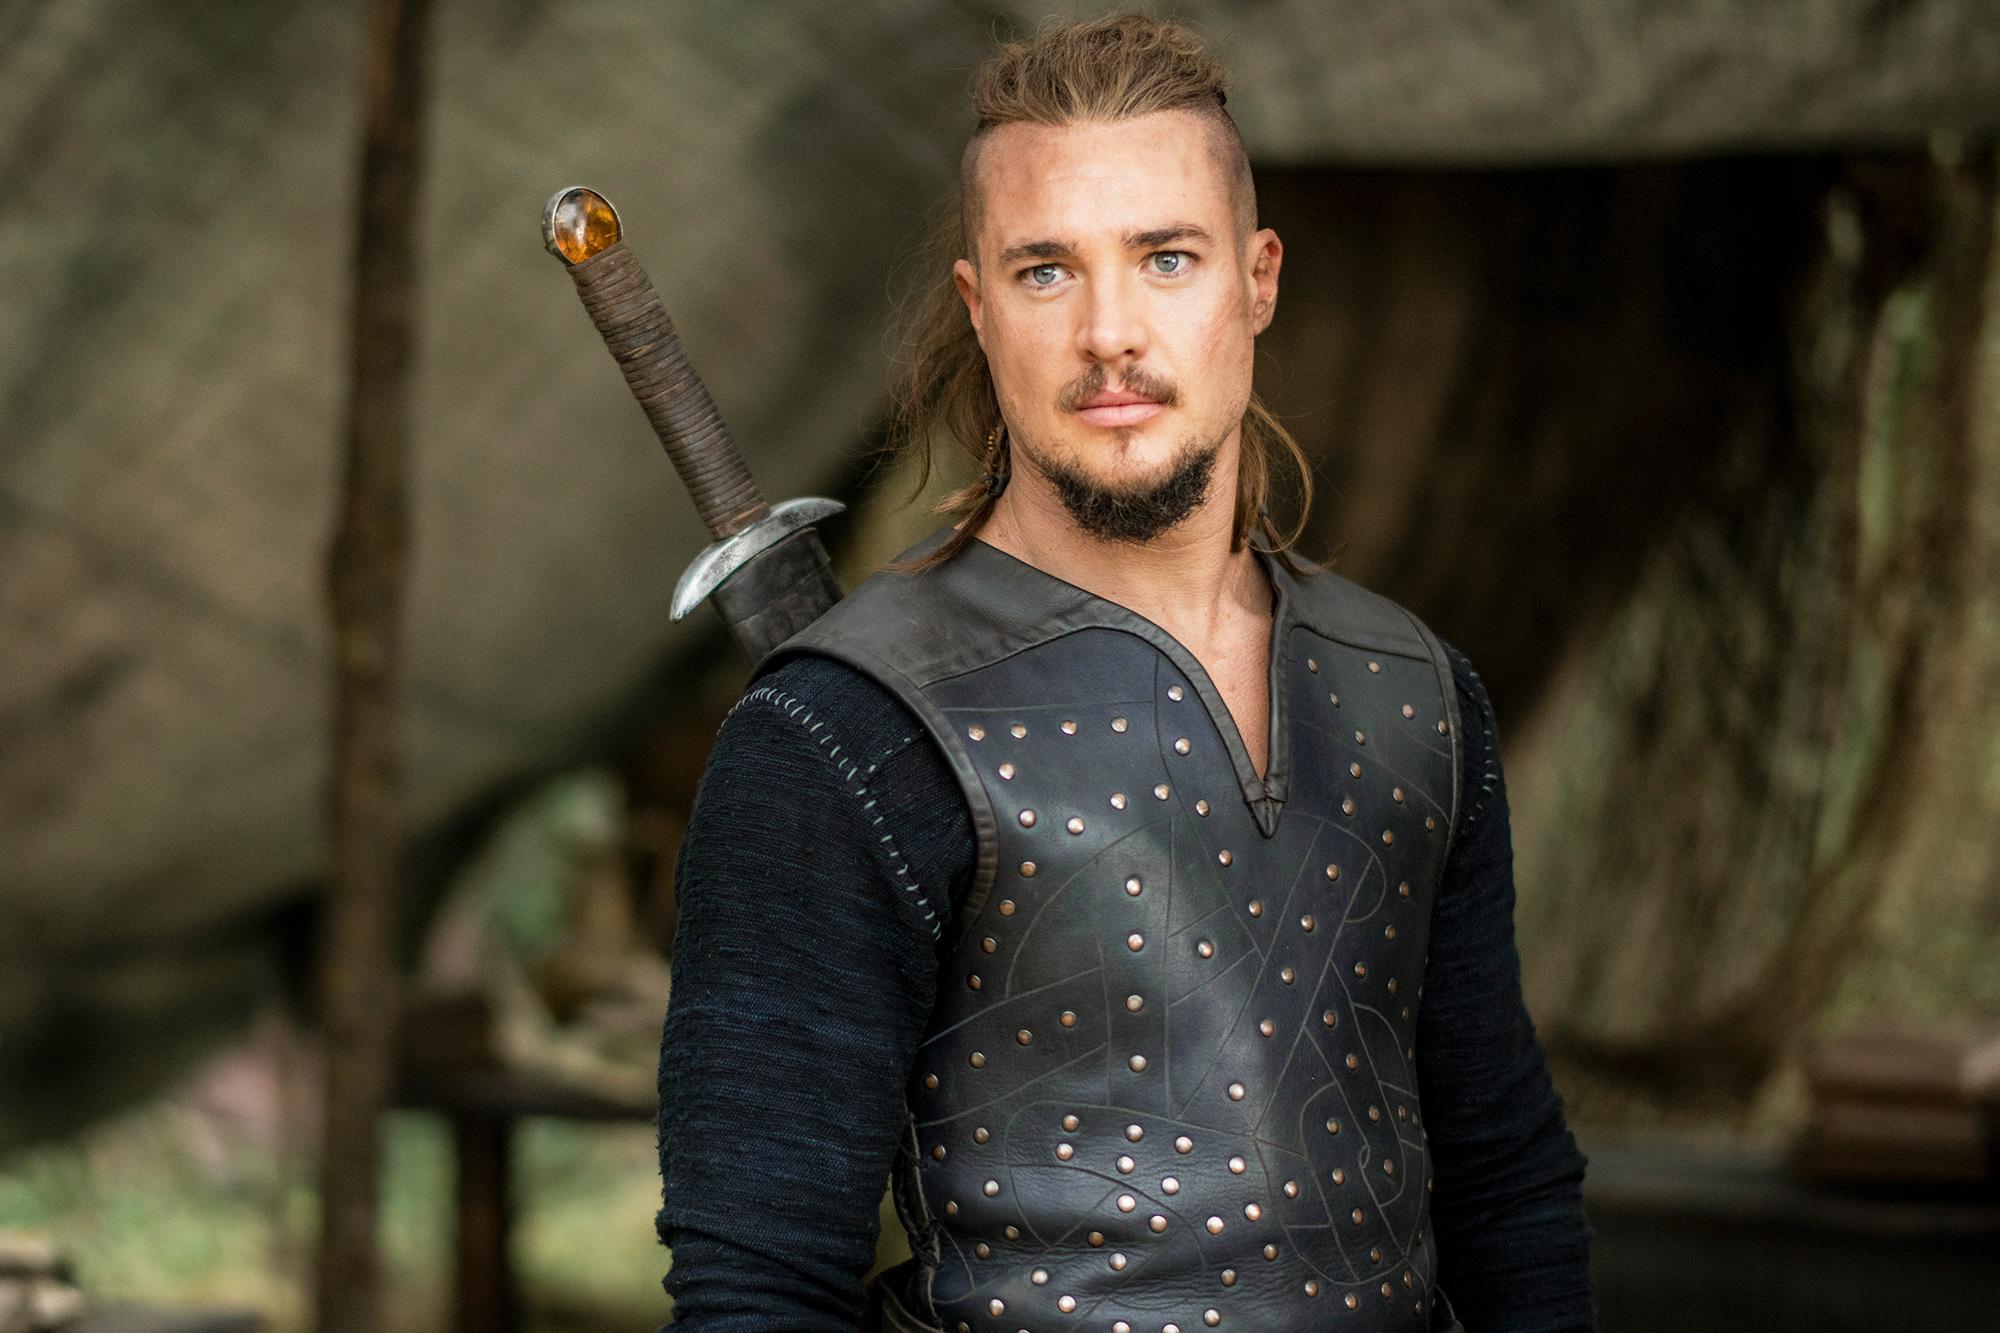 Alexander Dreymon as Uhtred The Last Kingdom Season 4